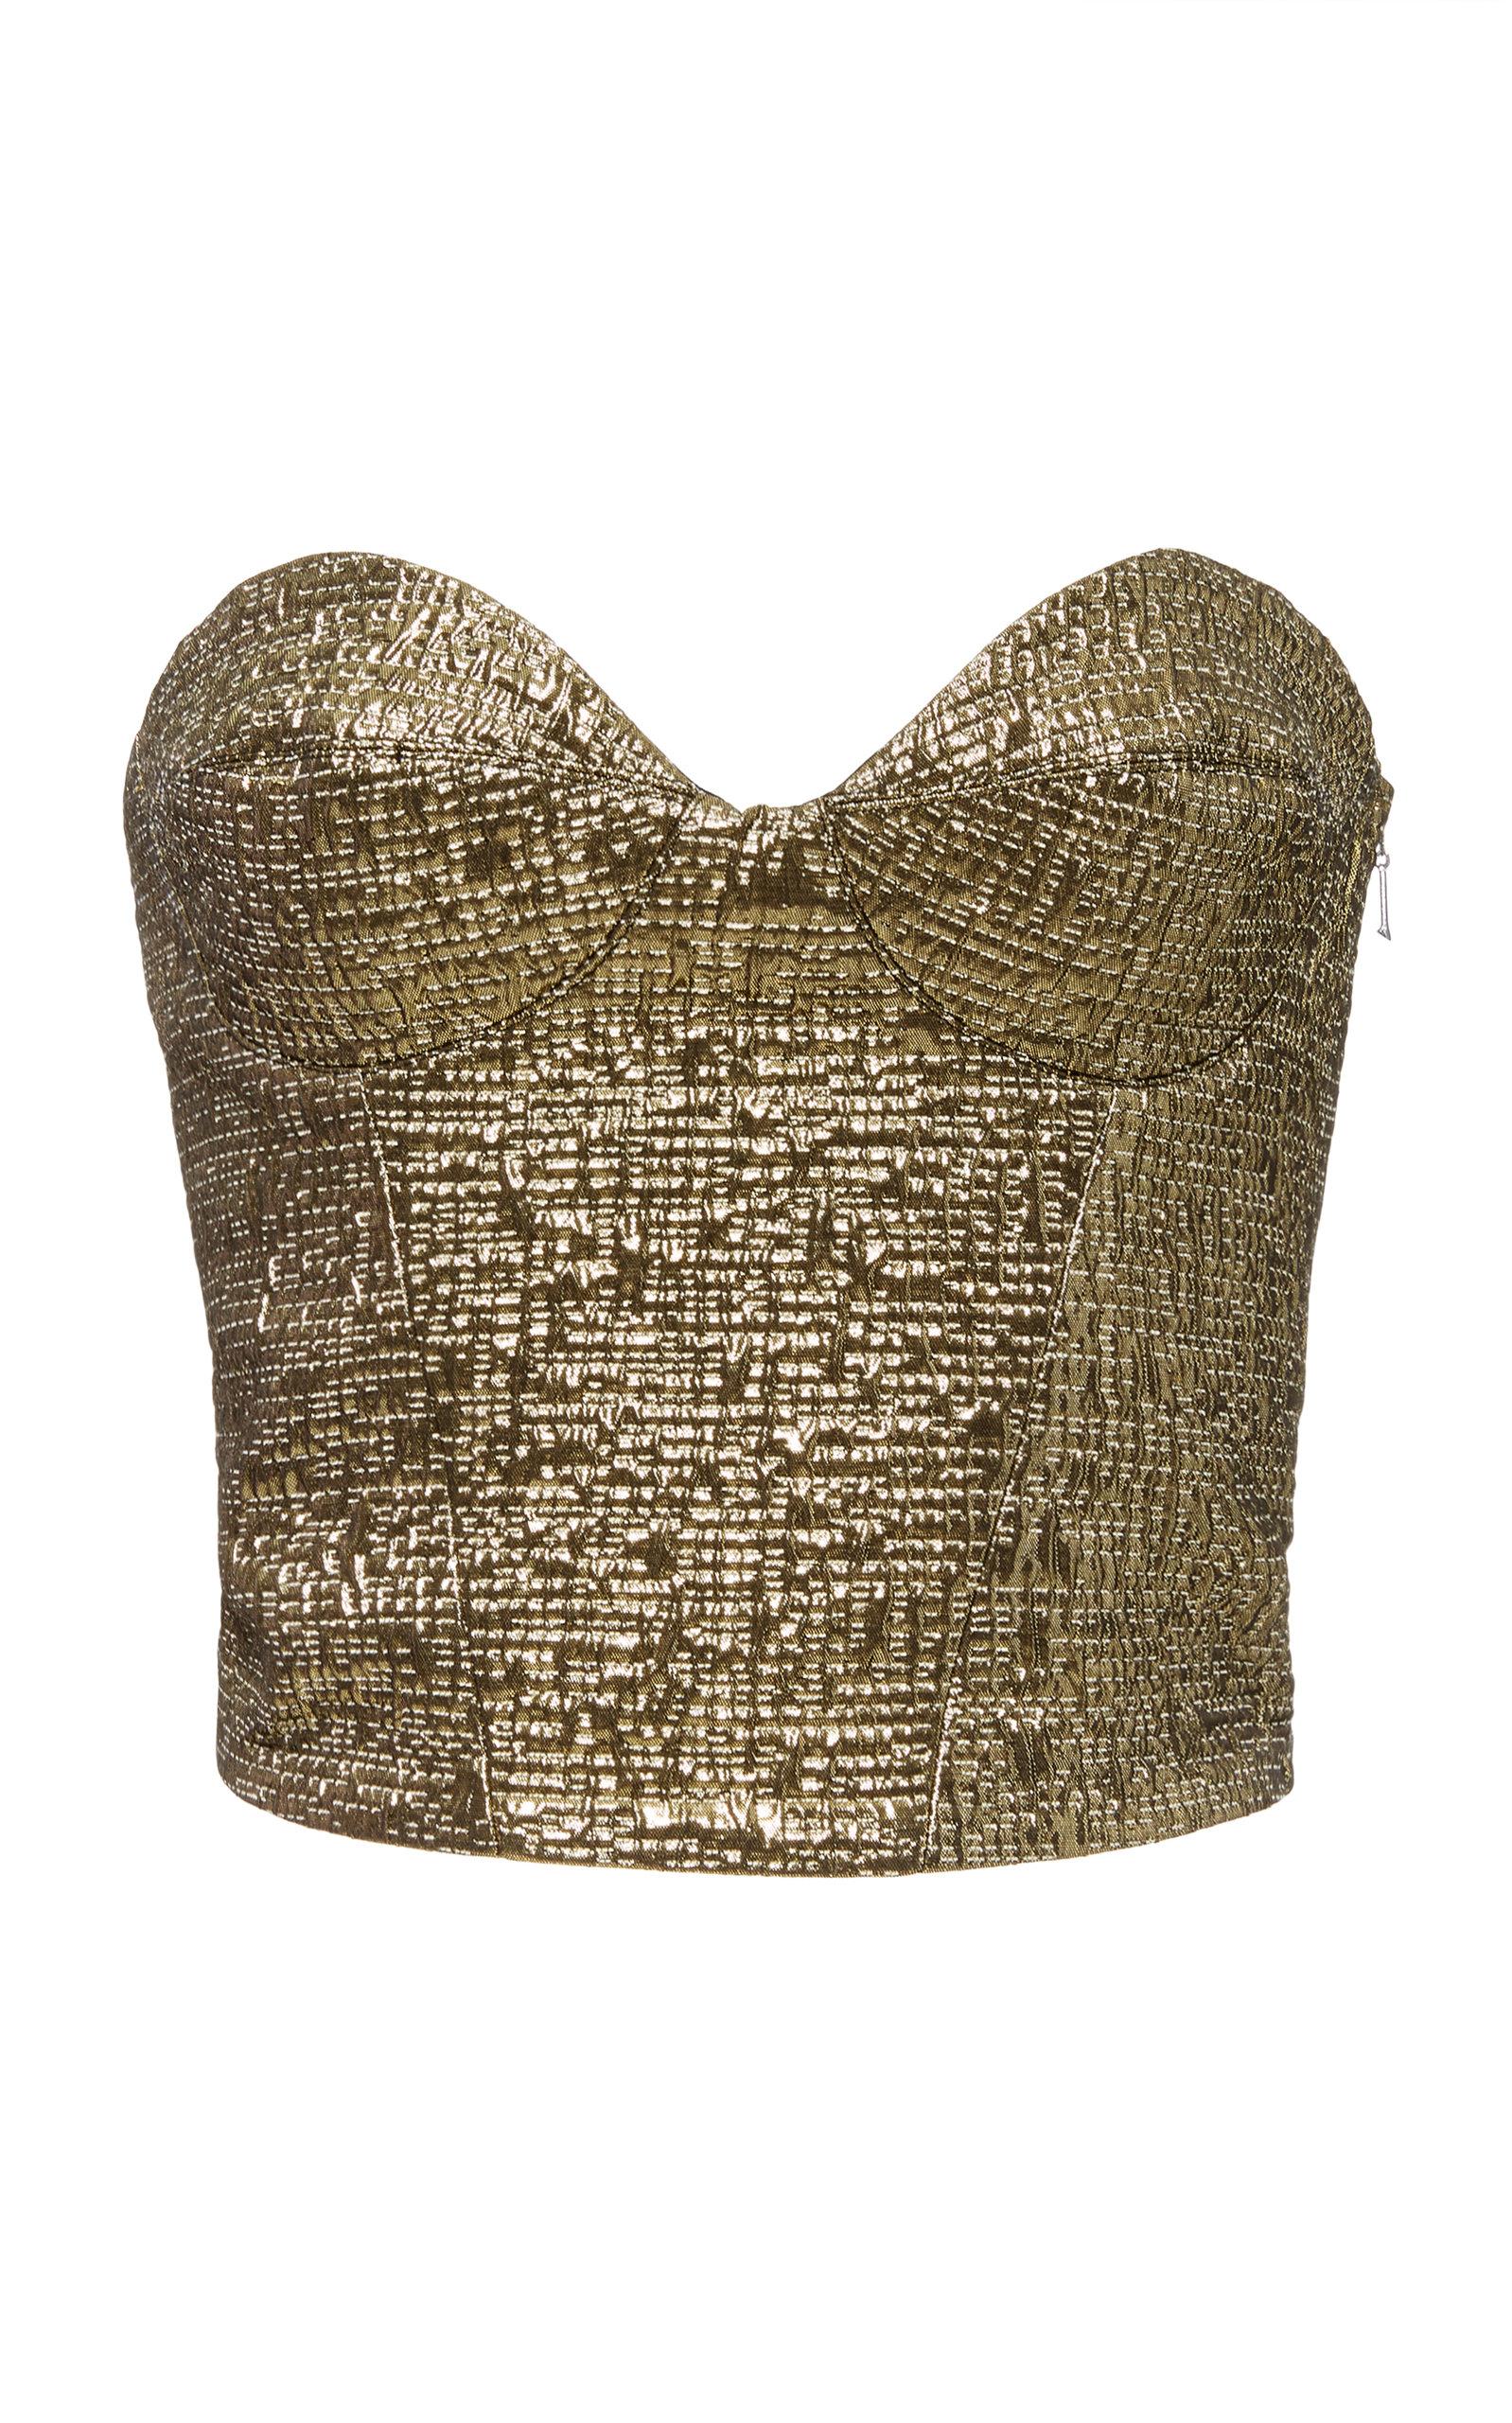 YULIYA MAGDYCH Doll Brocade Top in Gold